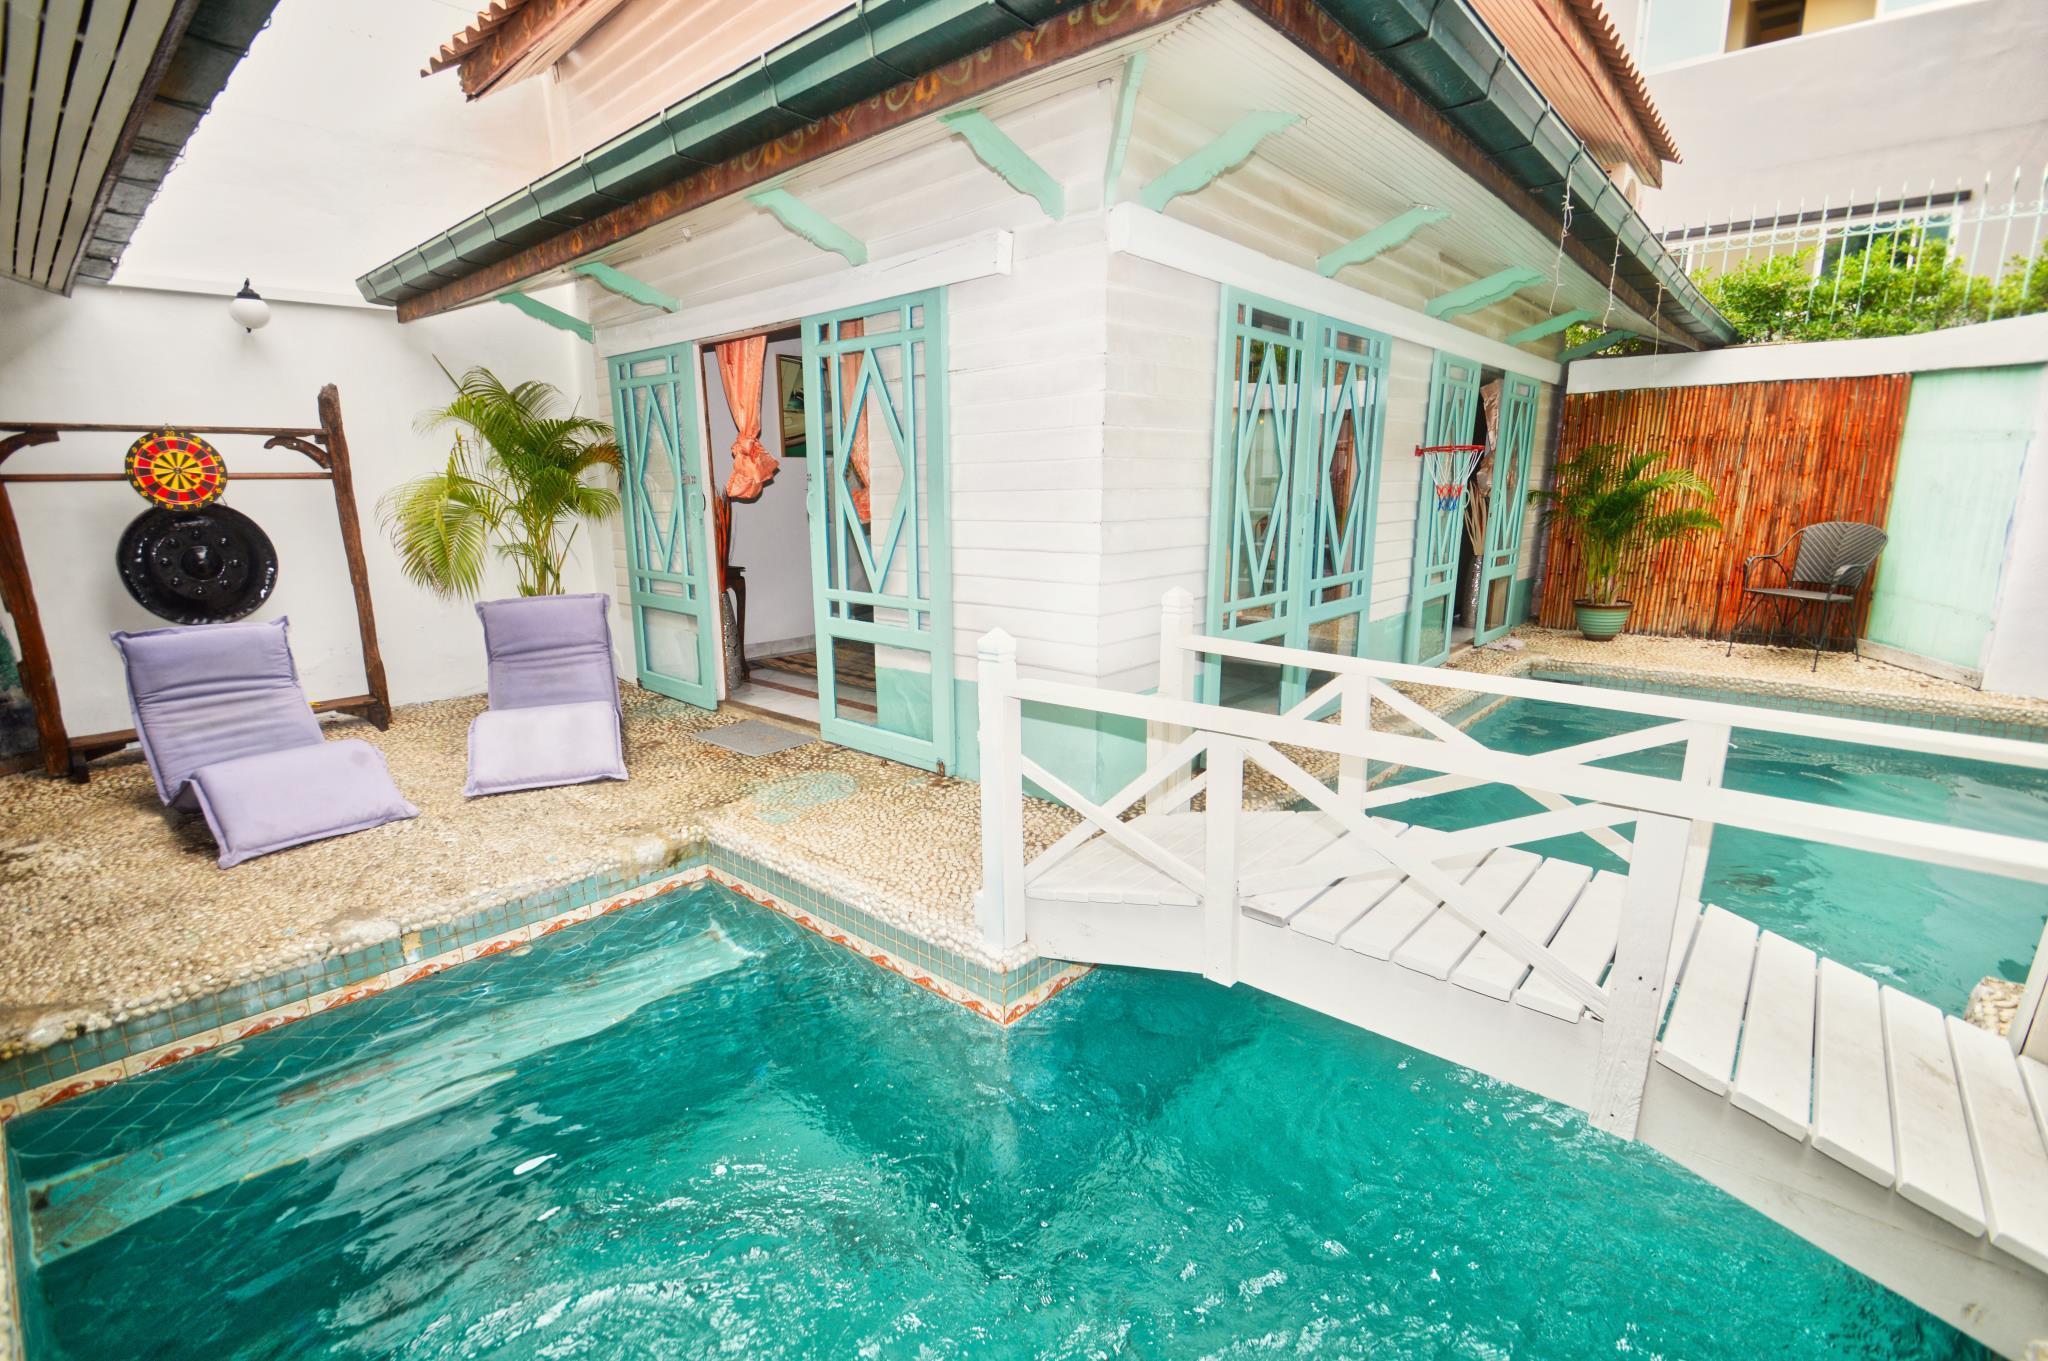 Romatic Private Pool Villa,โรแมนติก ไพรเวท พูล วิลลา